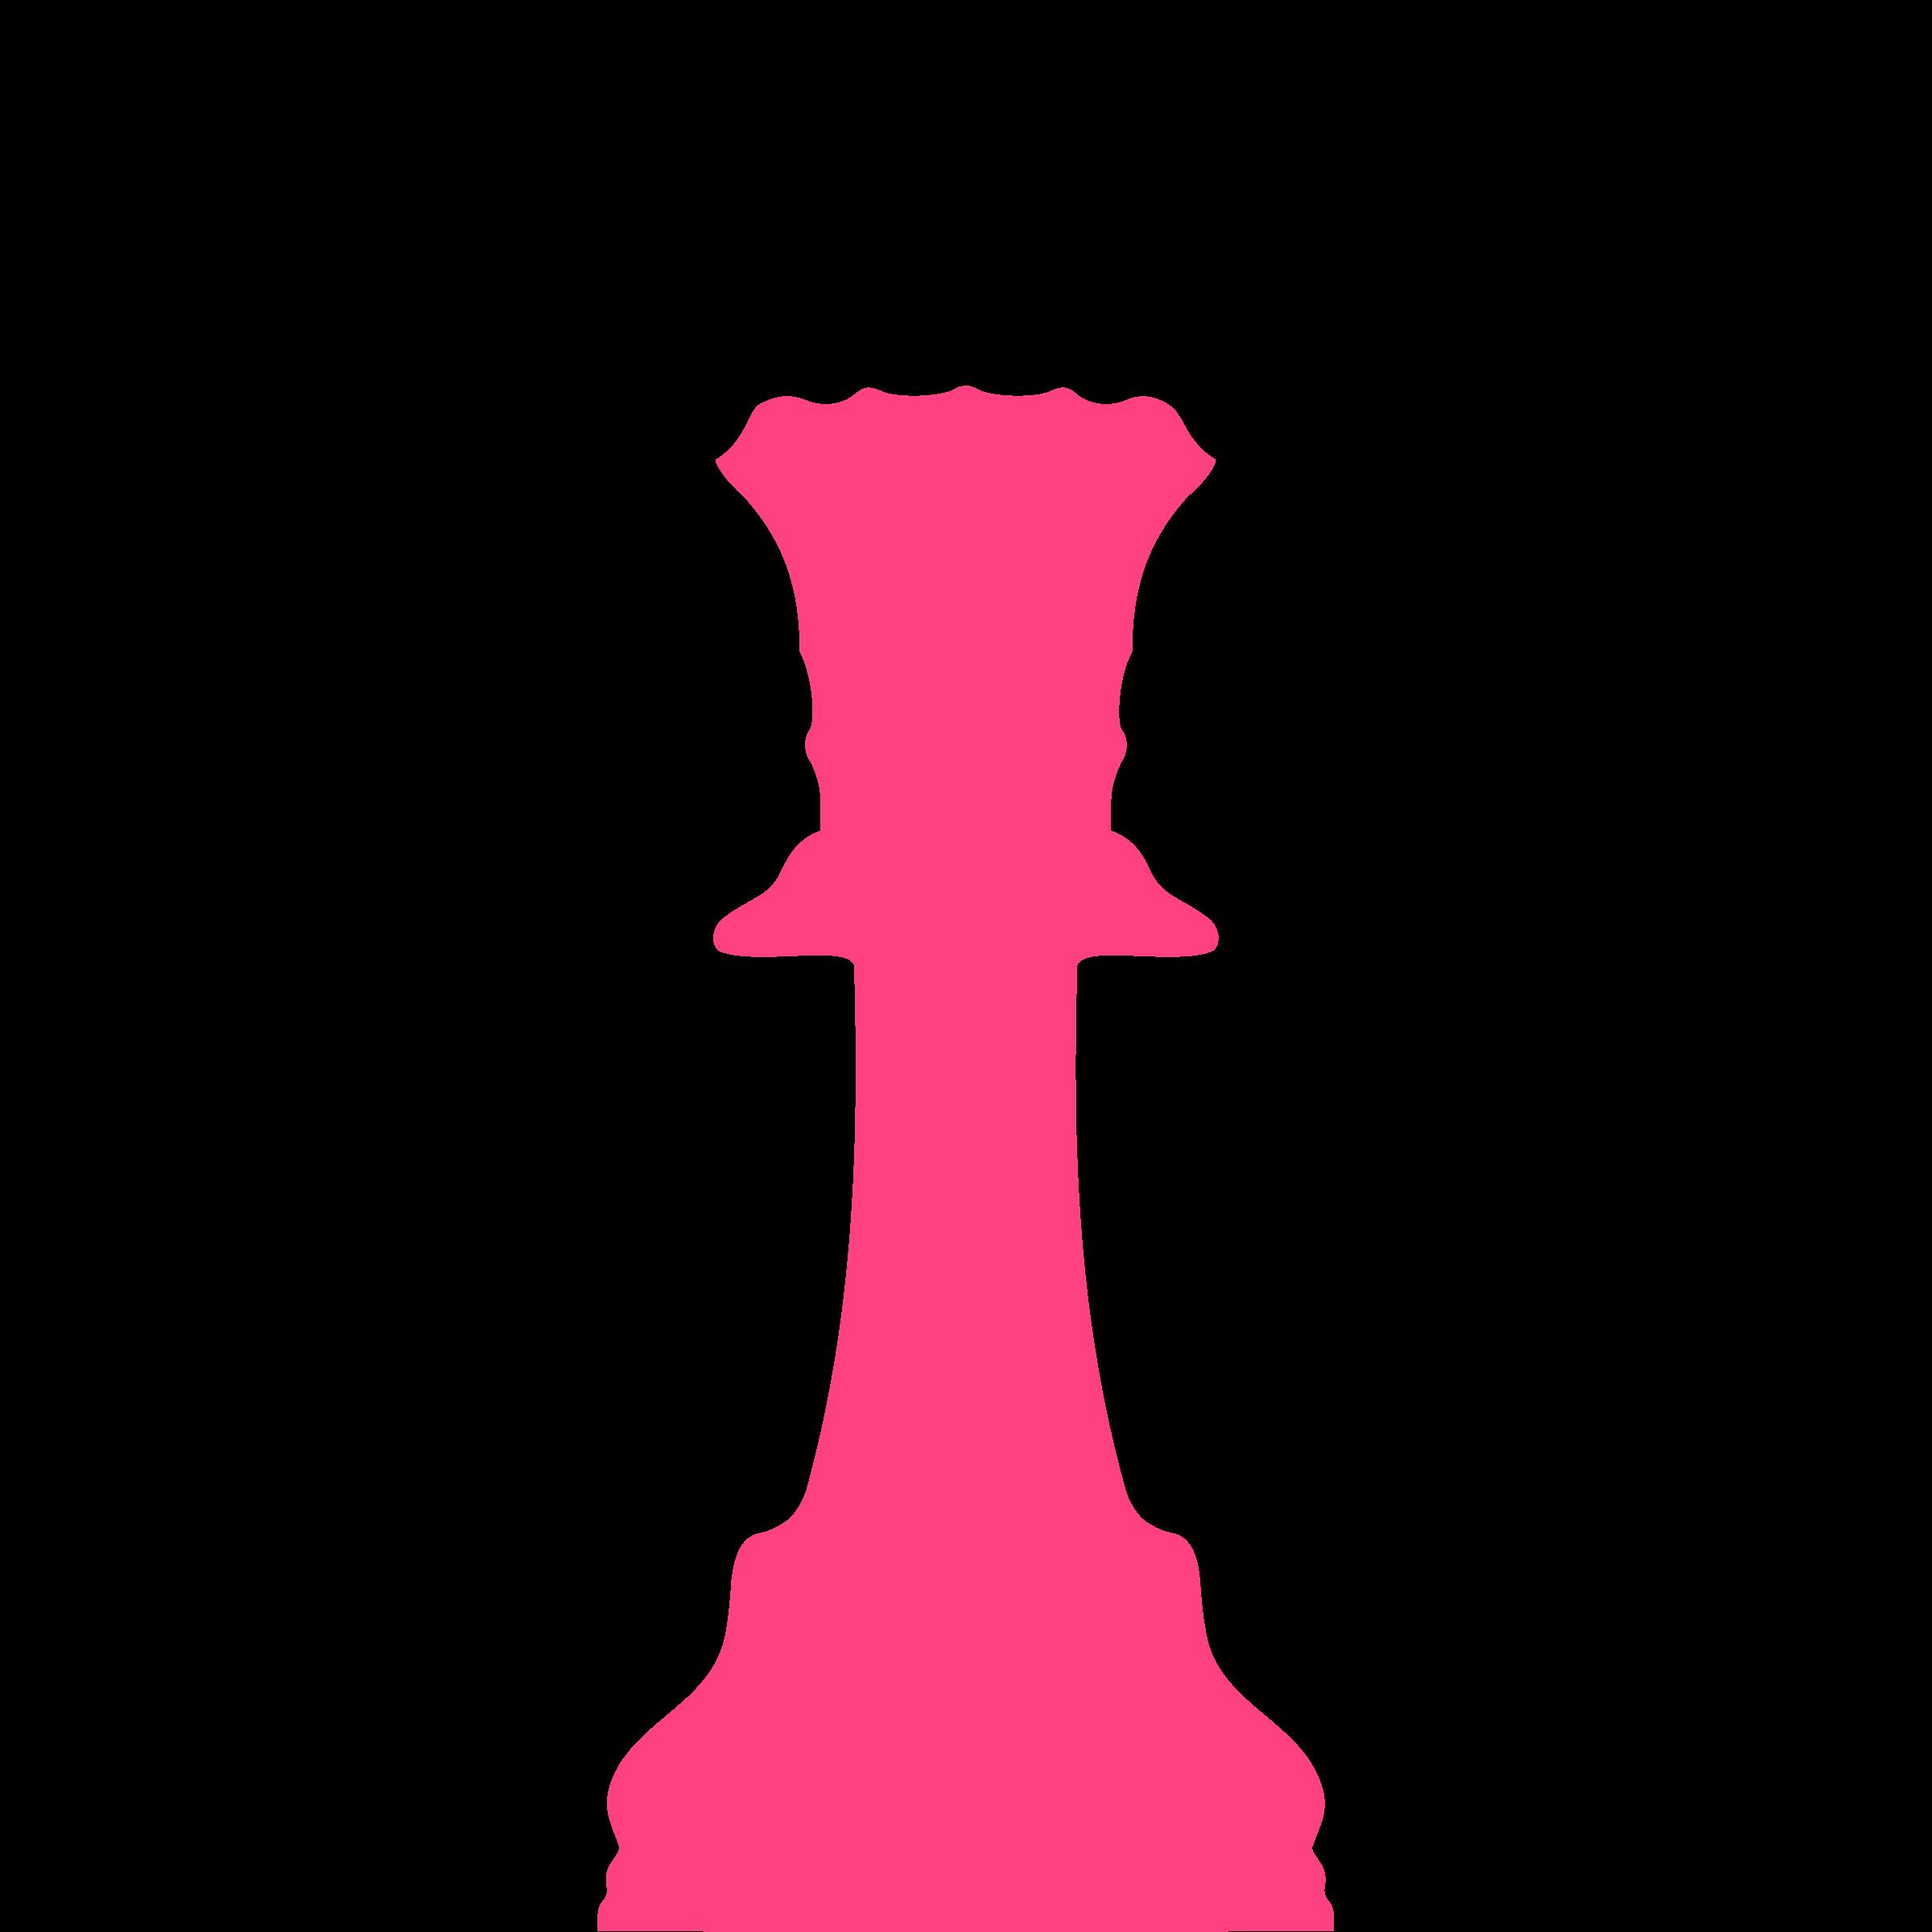 Queen clipart chess piece. Silhouette staunton dama big